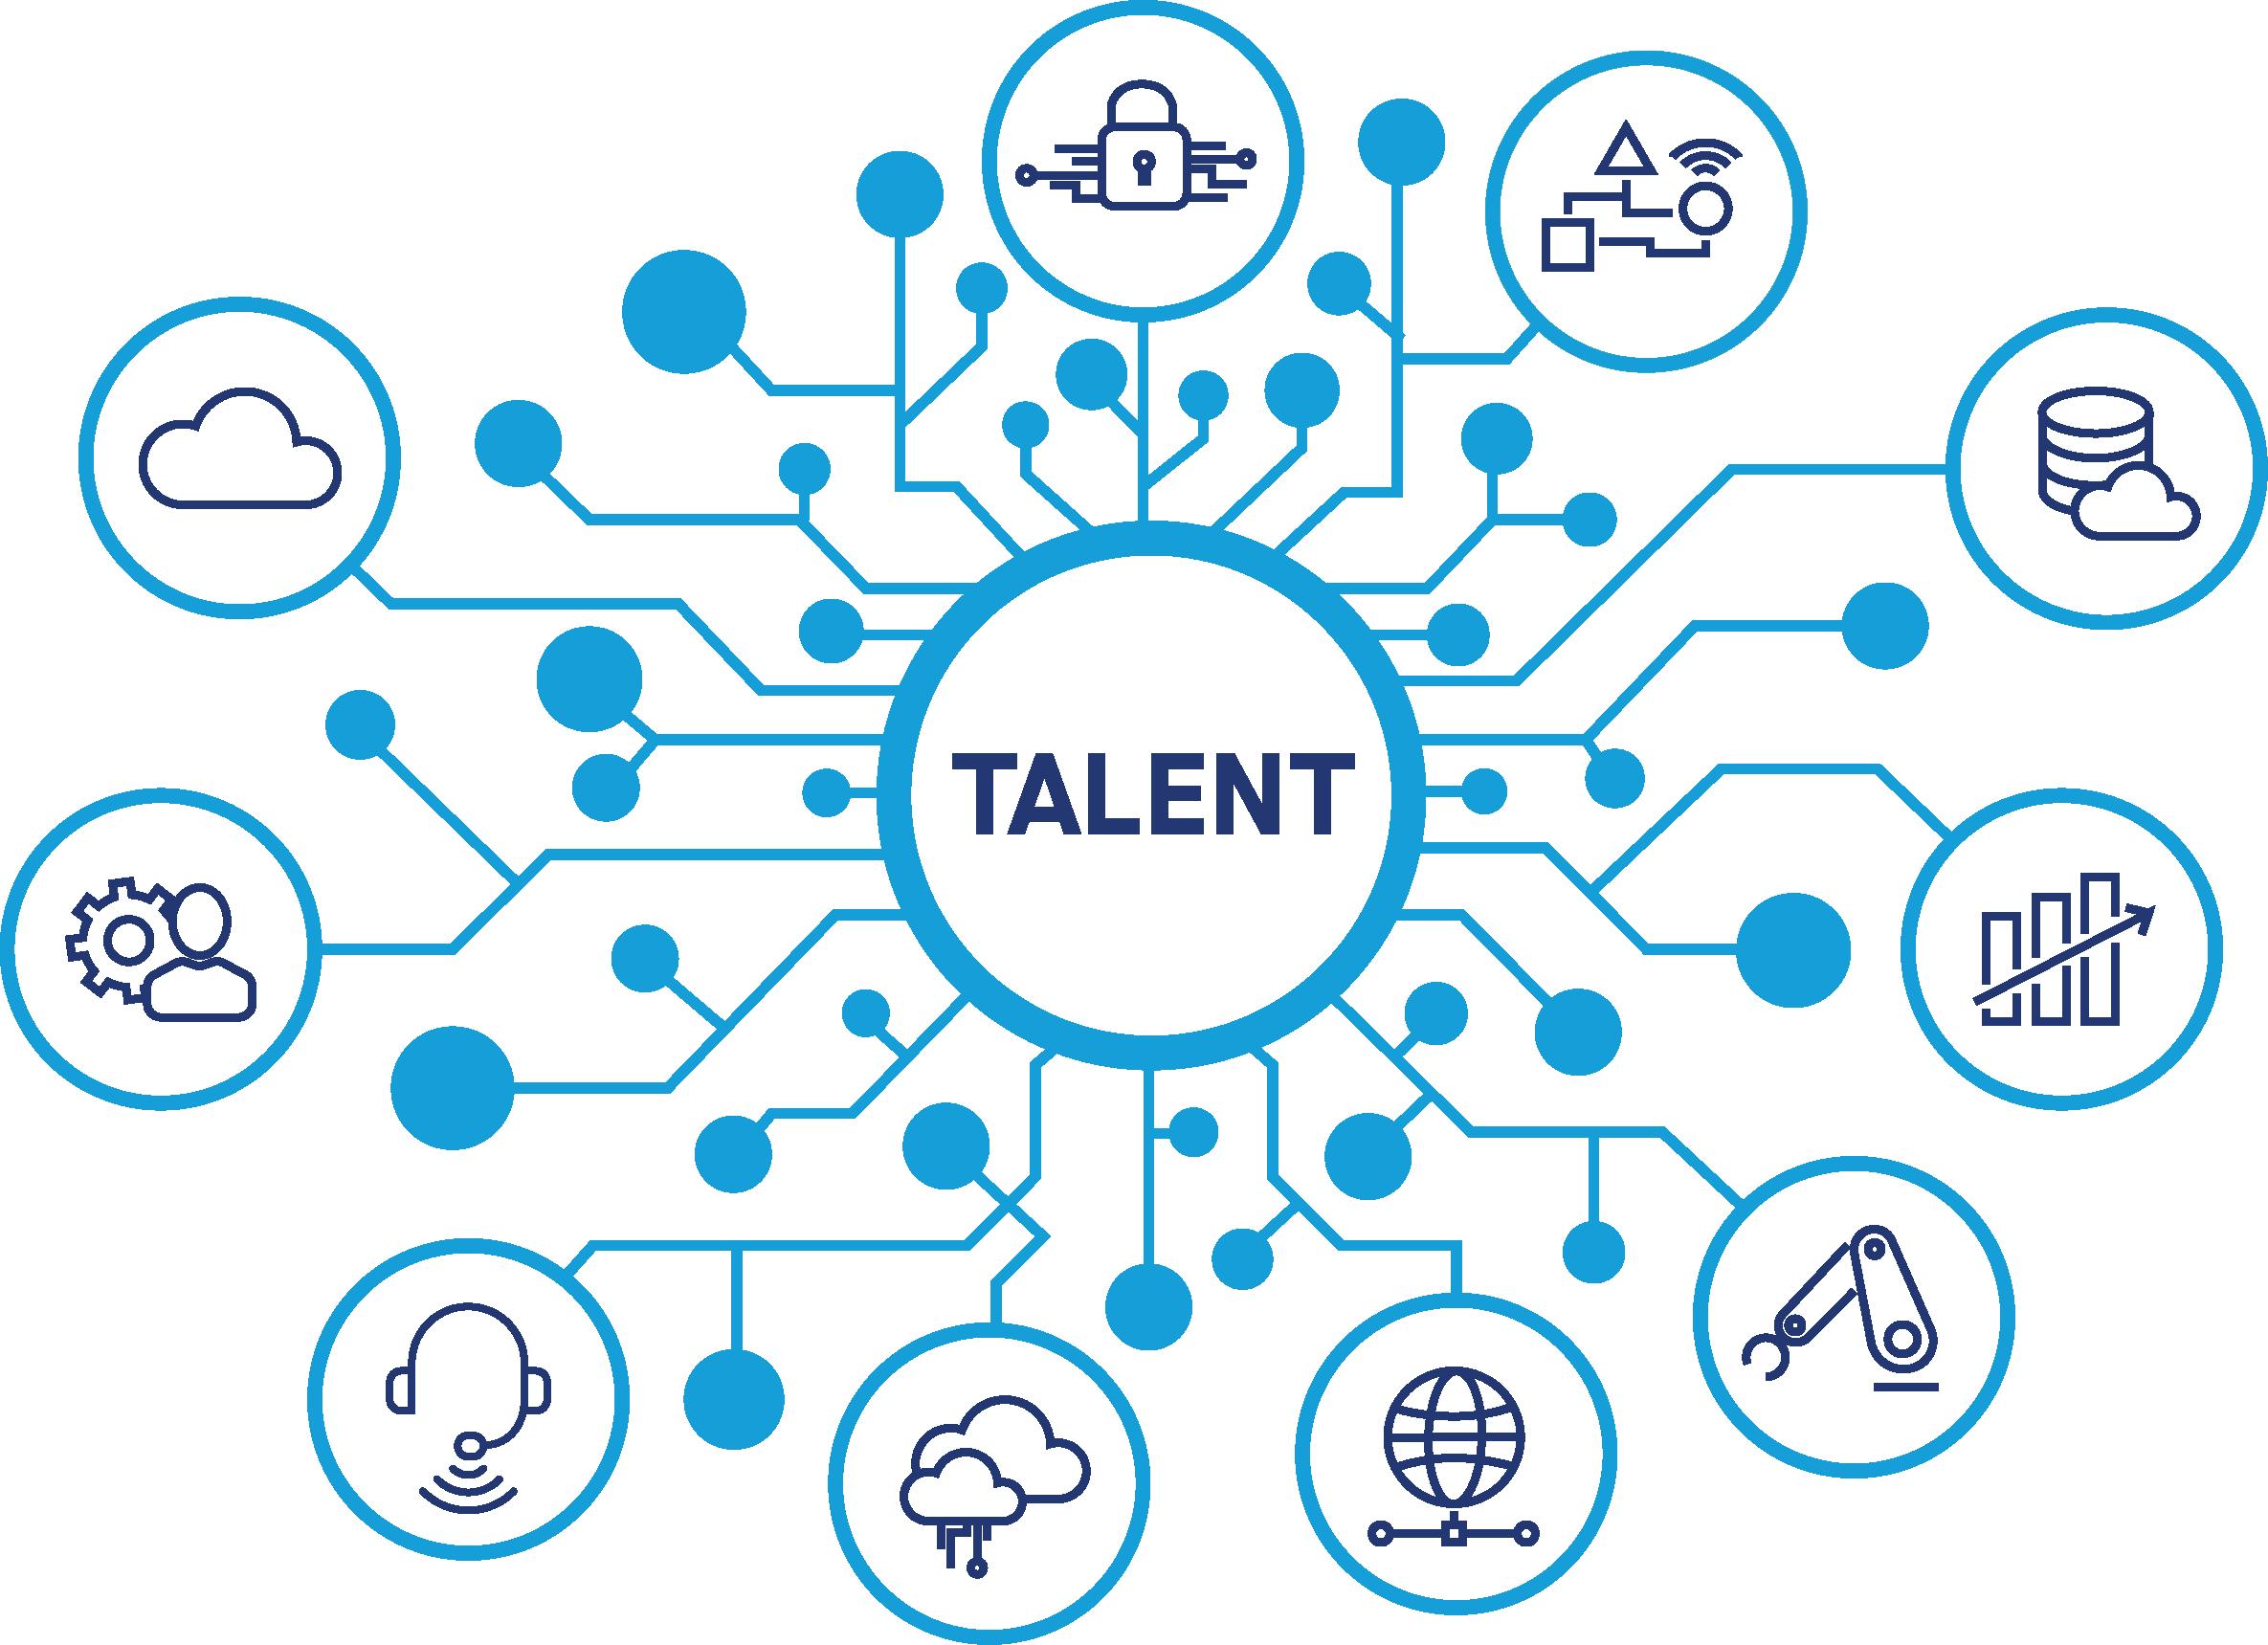 Talent Community